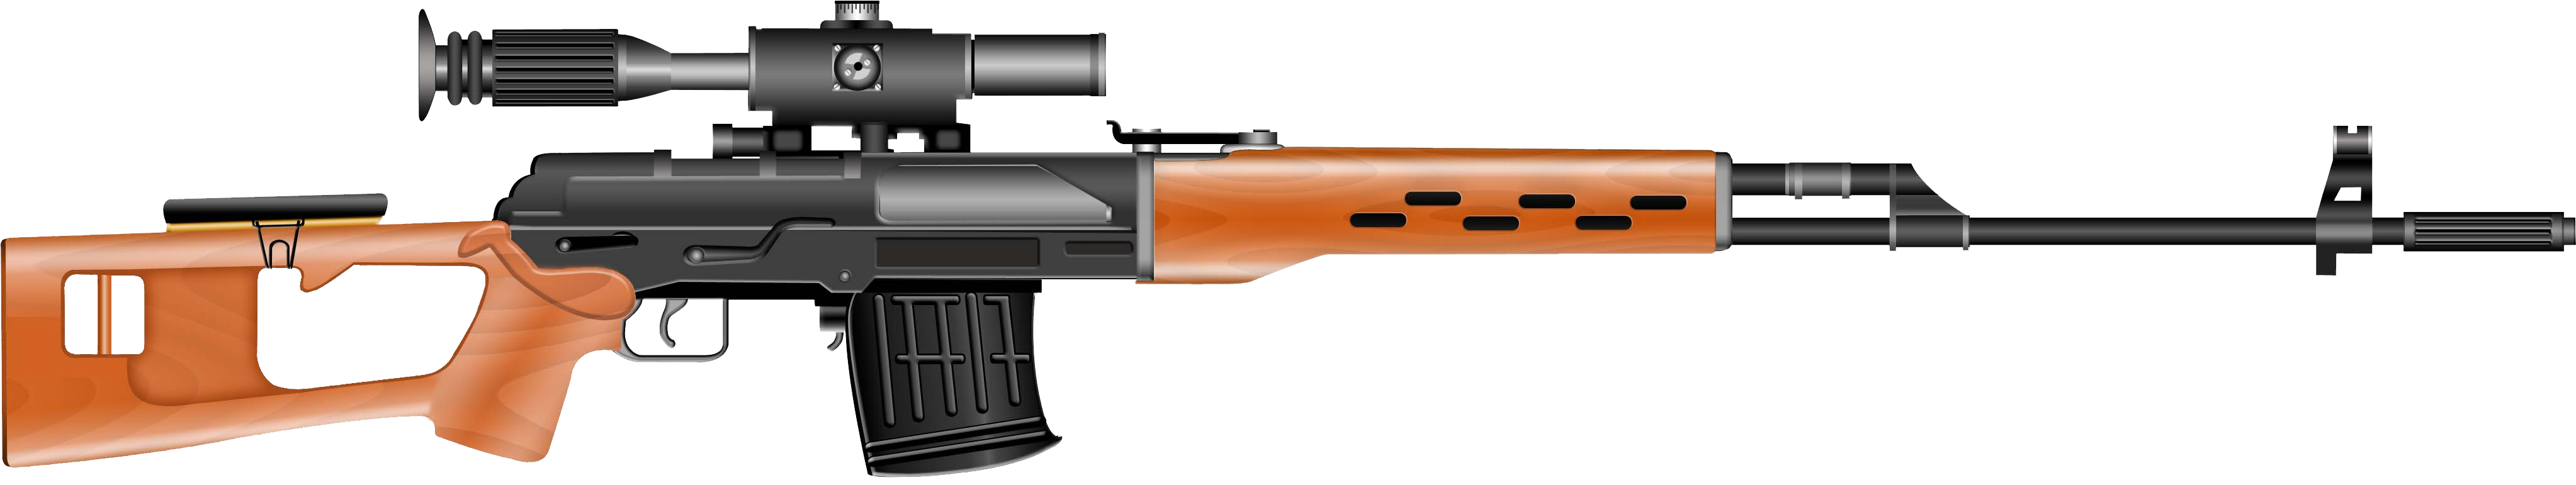 Clipart gun sniper, Clipart gun sniper Transparent FREE ...